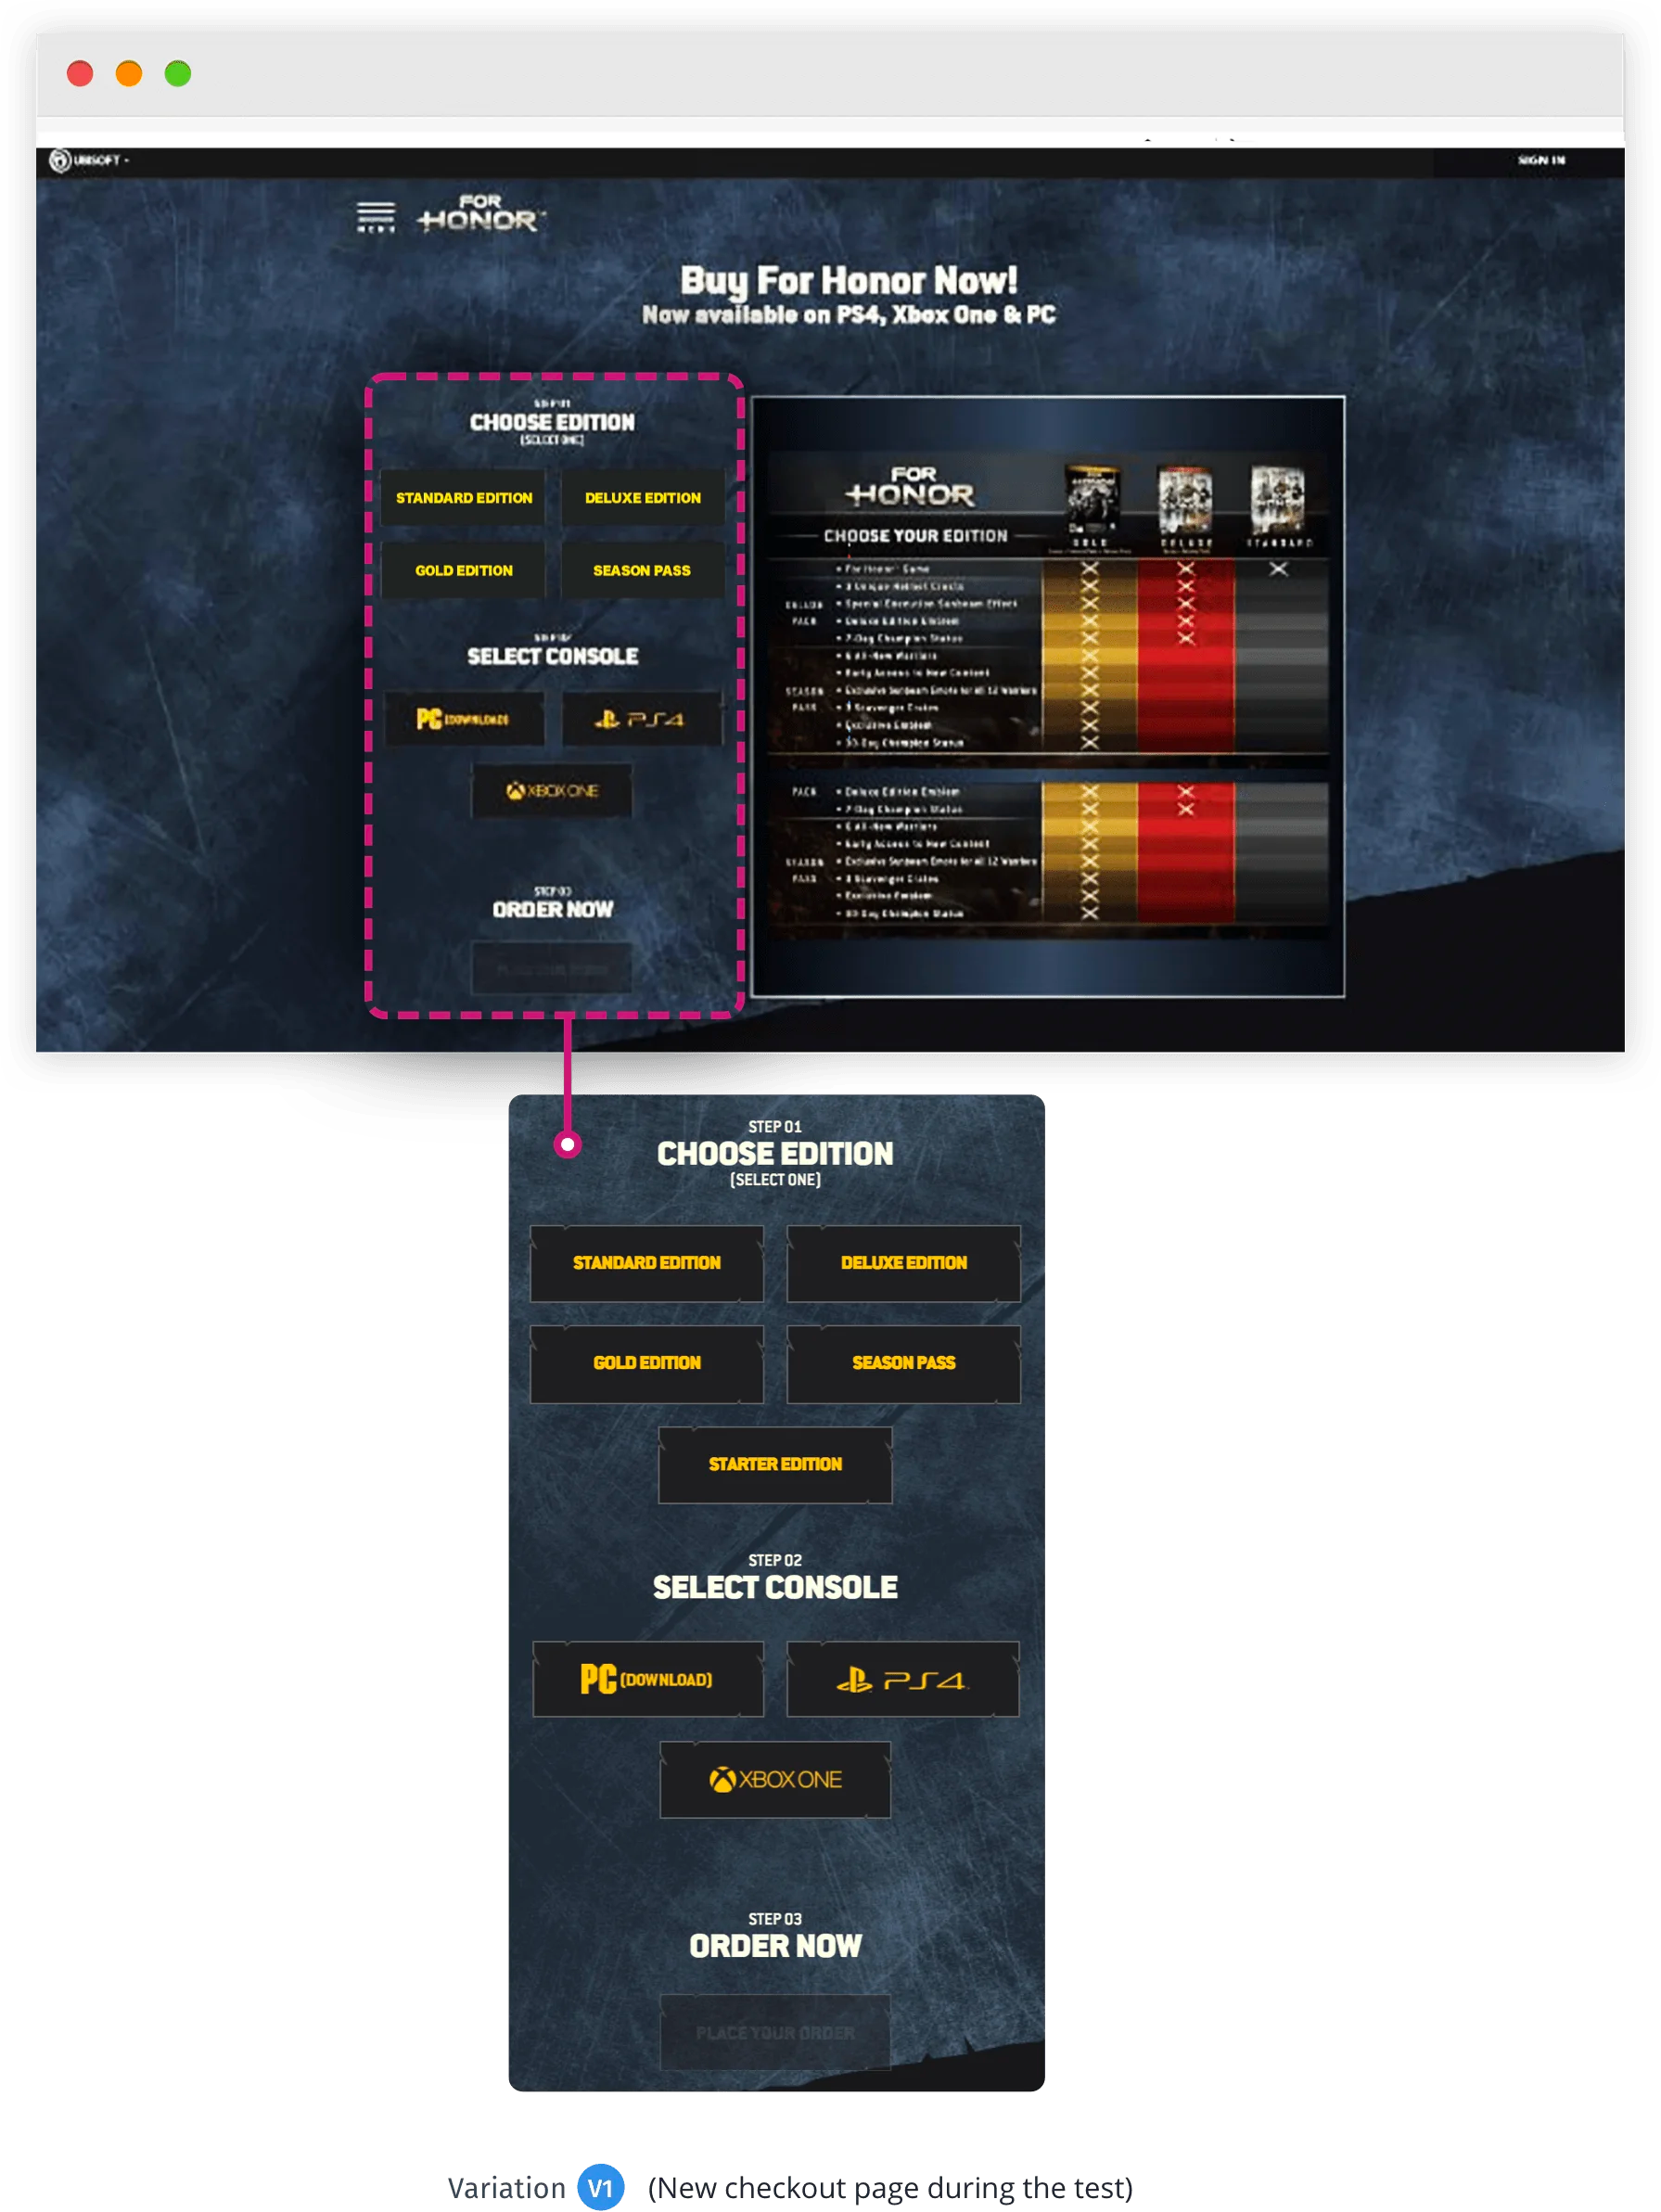 Ubisoft Variation